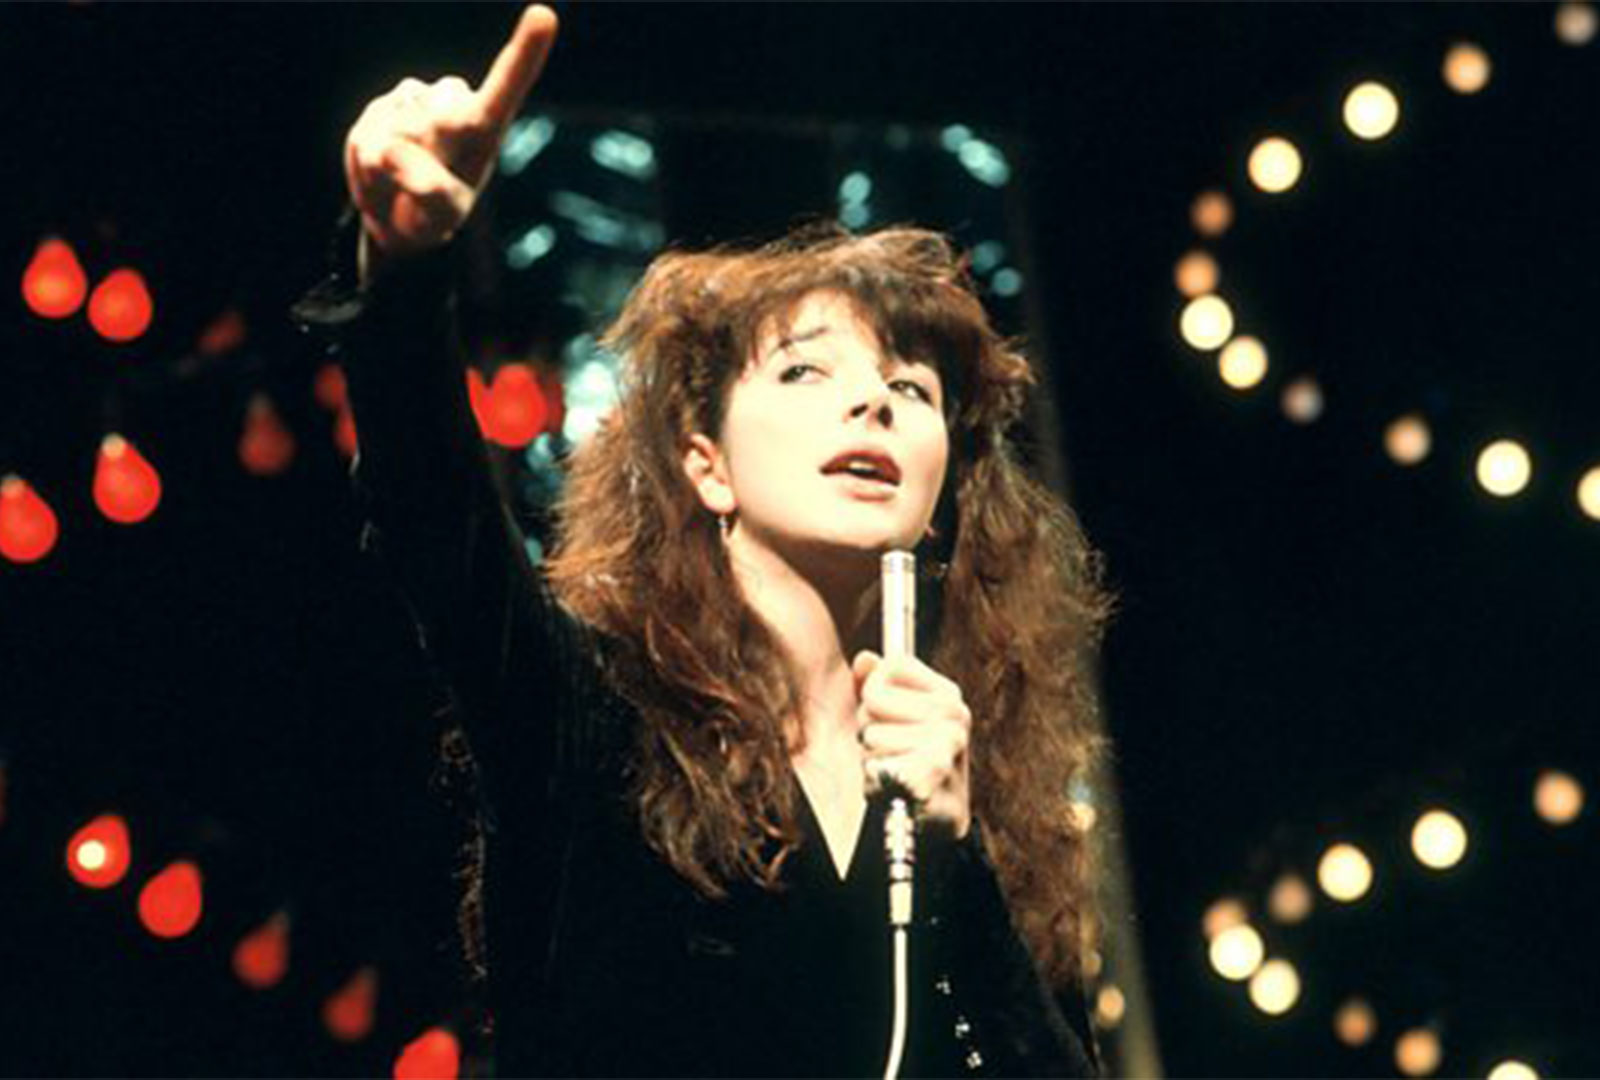 Explore Kate Bush's BBC performances during '78-'94